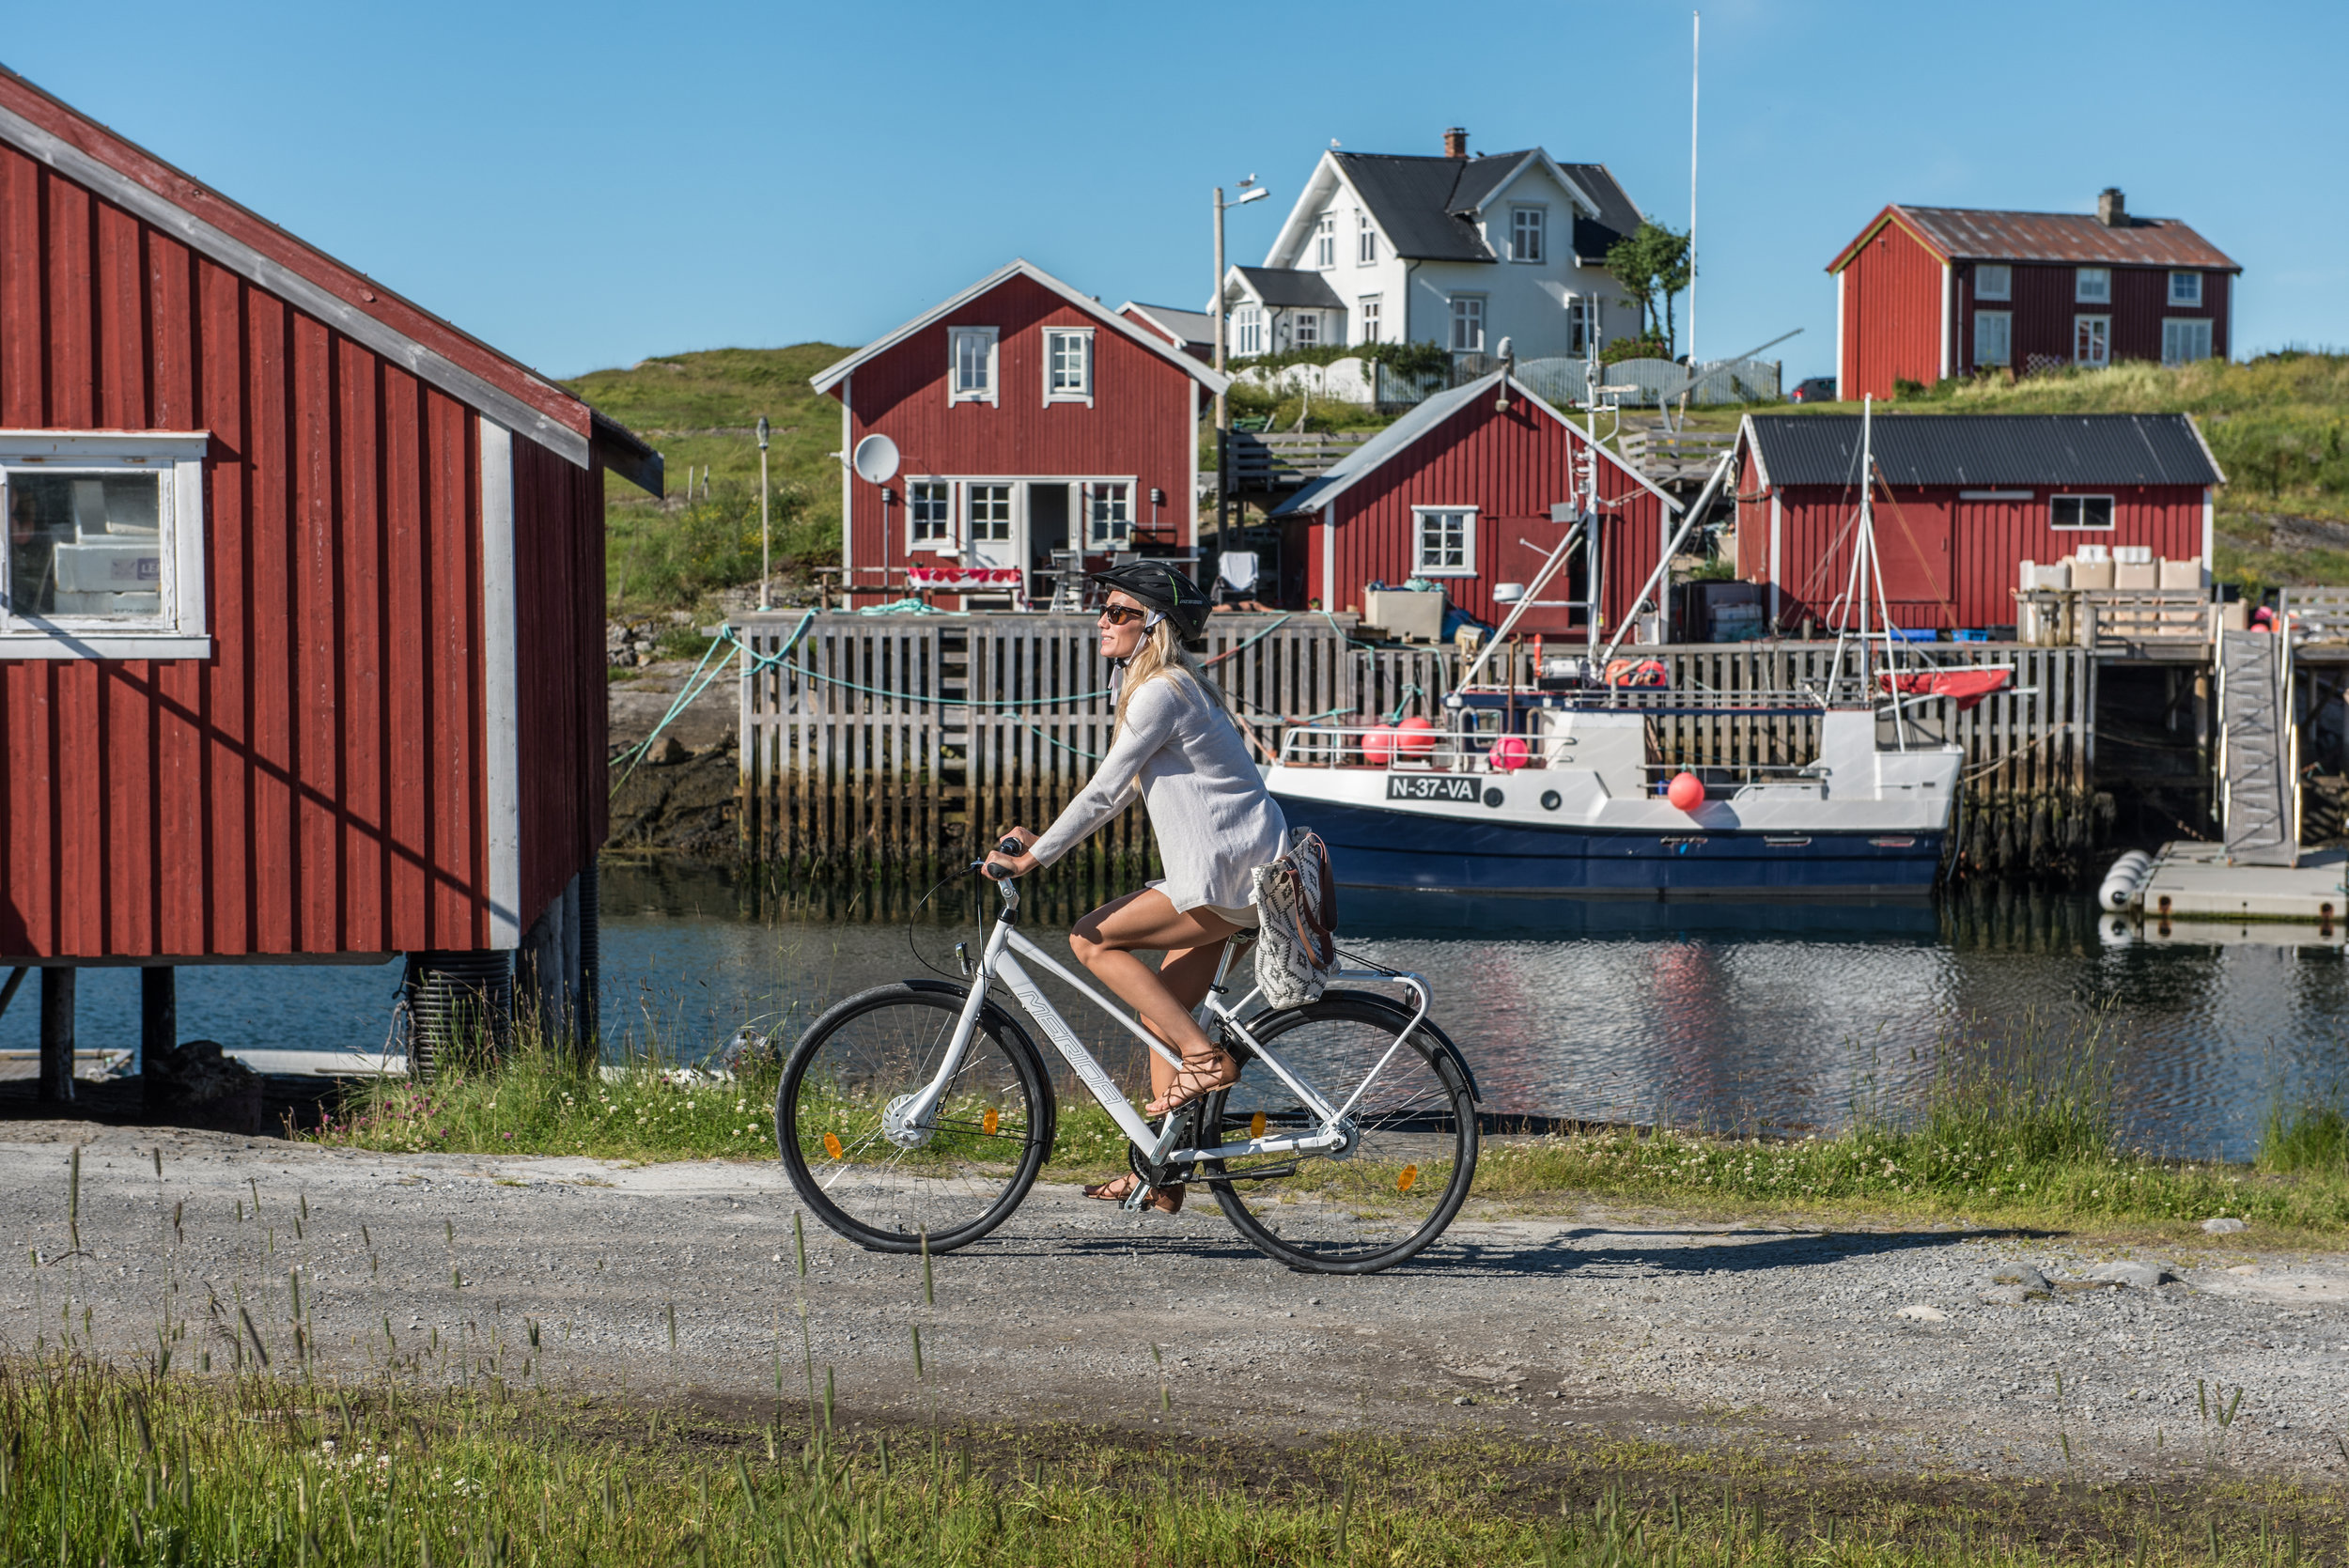 Foto: Terje Rakke/Nordic Life